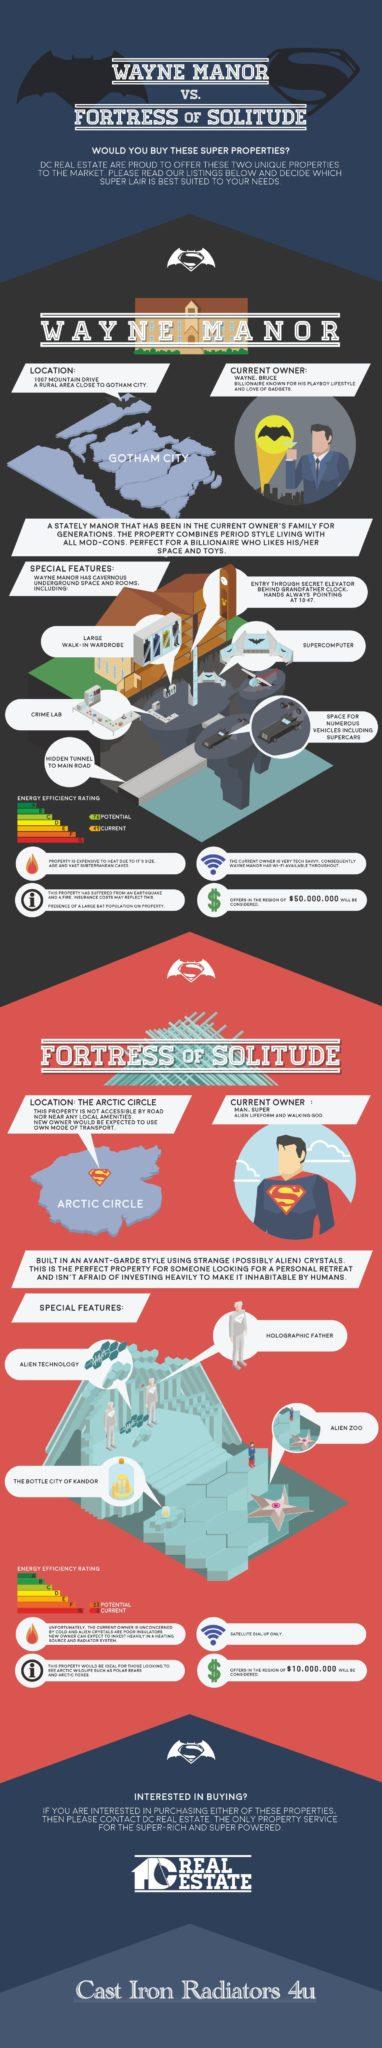 Wayne Manor vs Fortress of Solitude by Cast Iron Radiators 4u